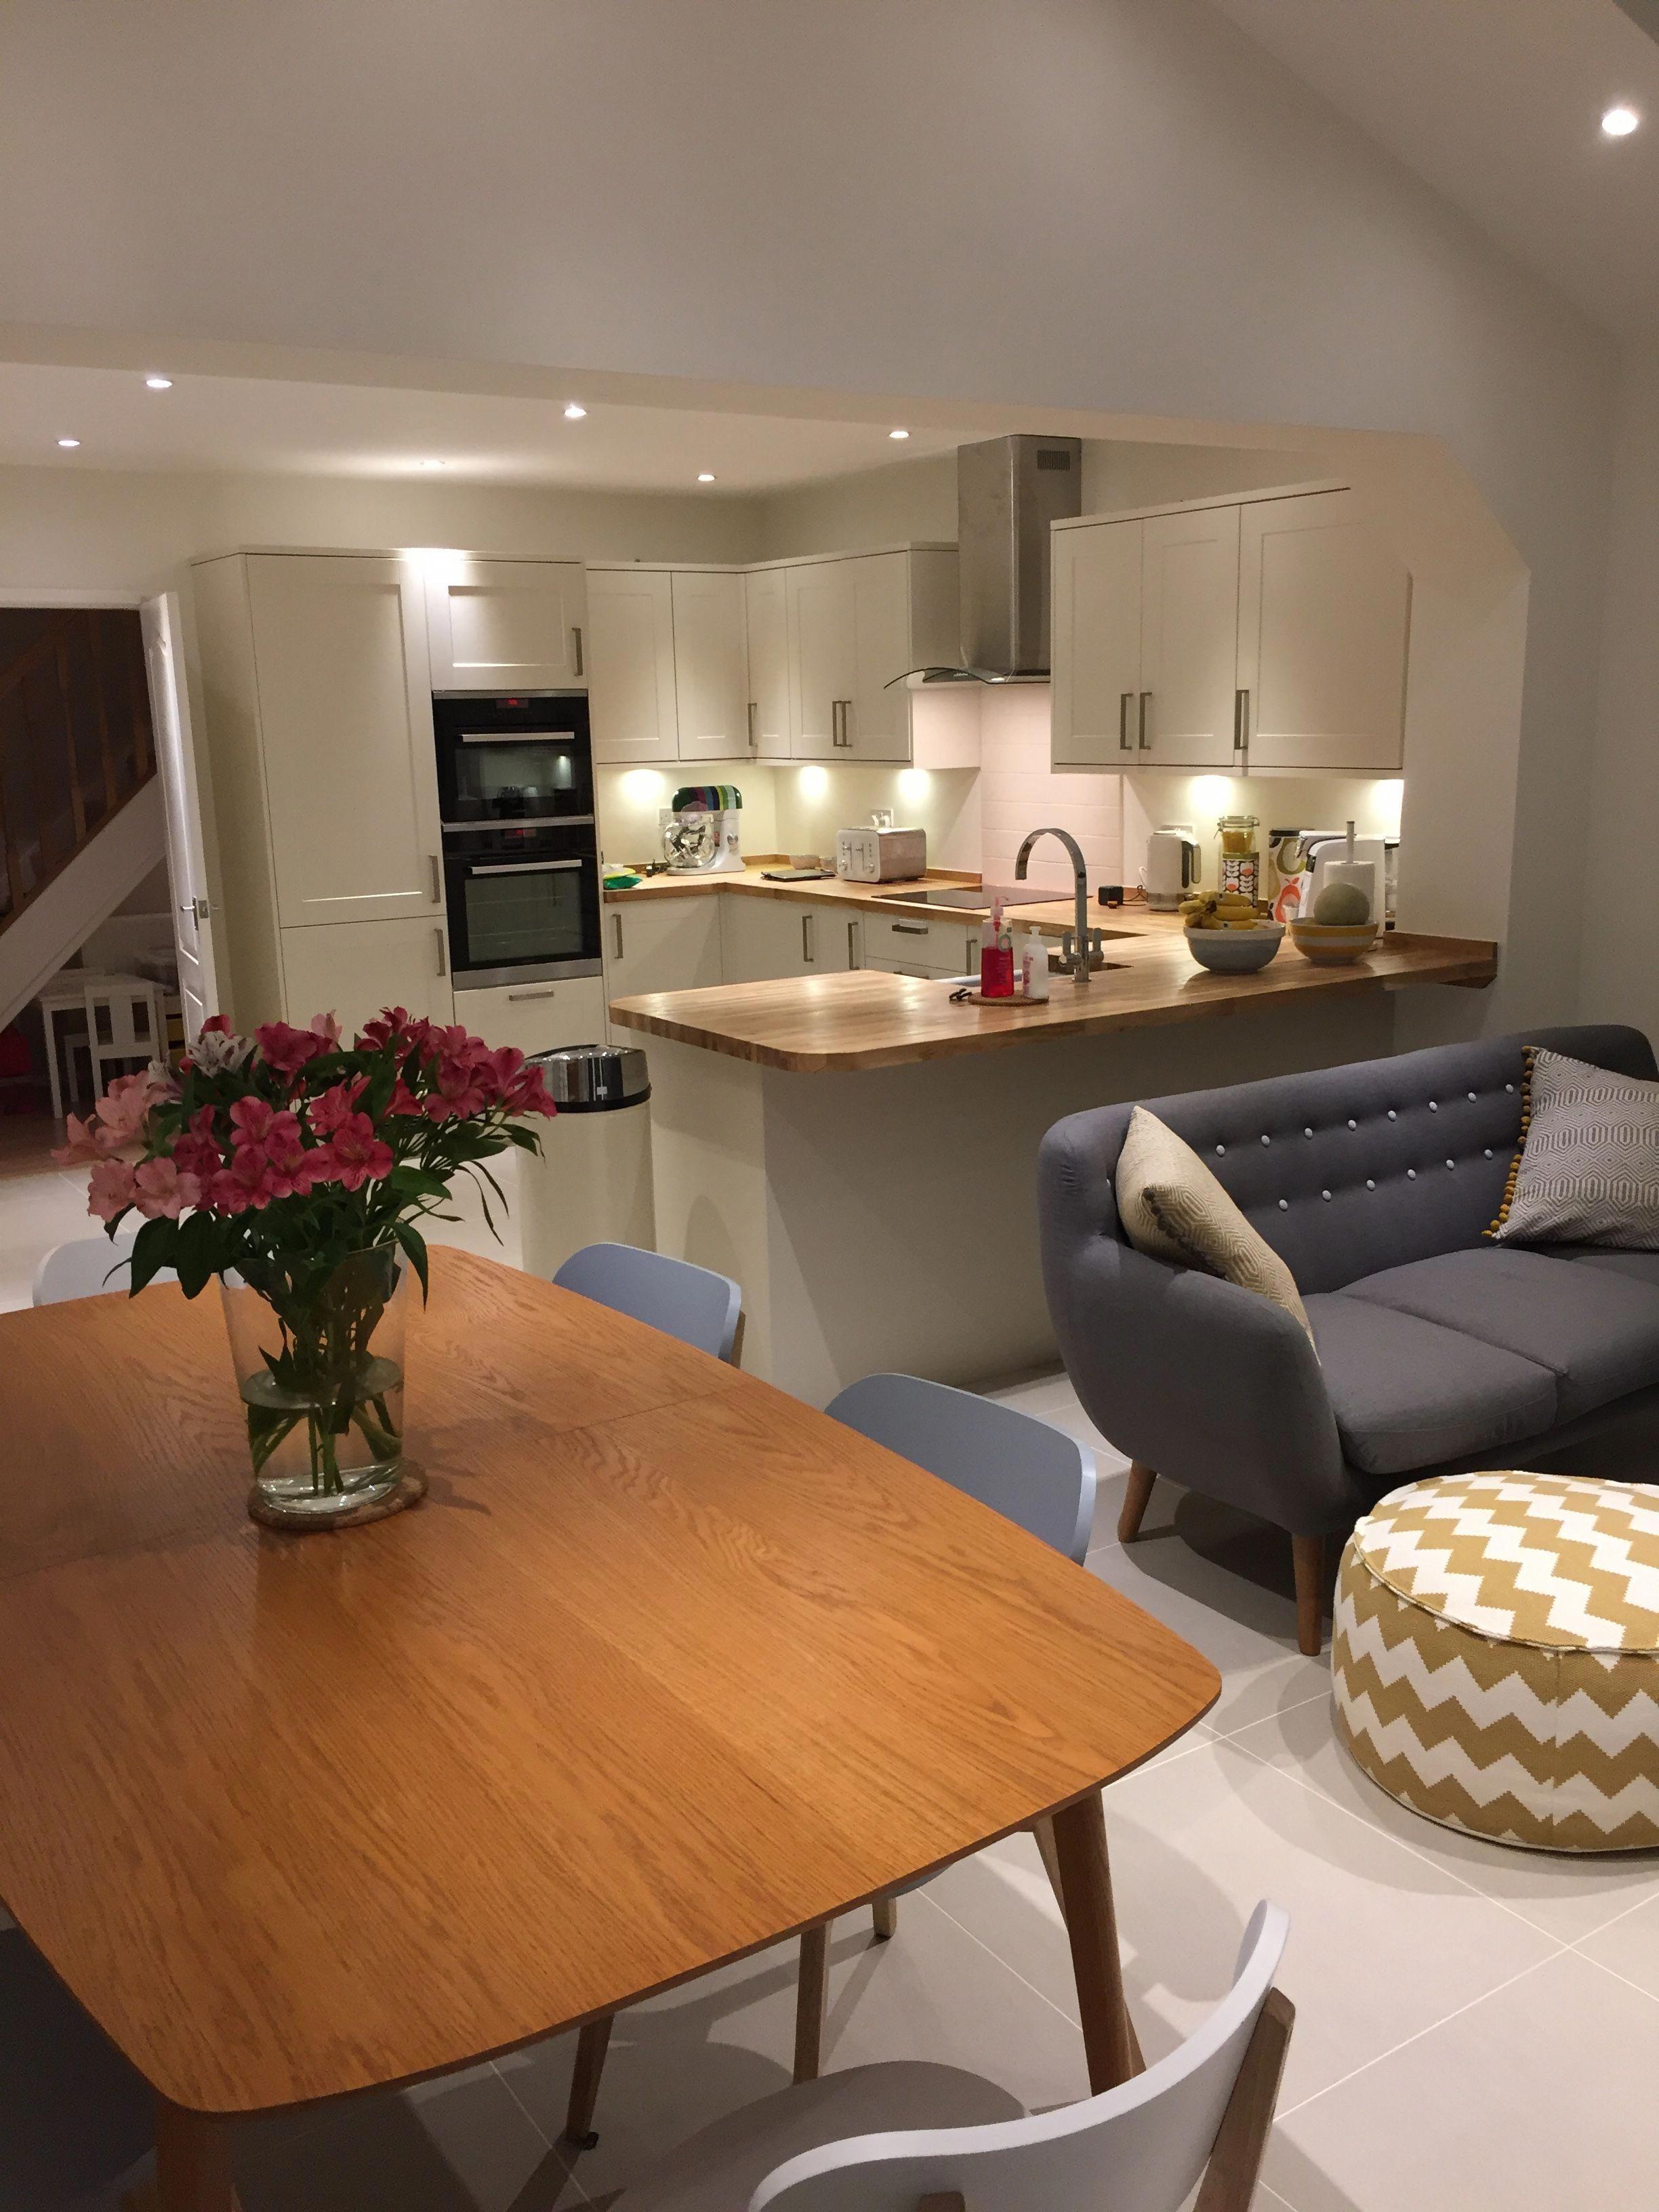 Our 7 Best Home Organization Ideas In 2020 Modern Kitchen Open Plan Living Room And Kitchen Design Open Plan Kitchen Dining Living